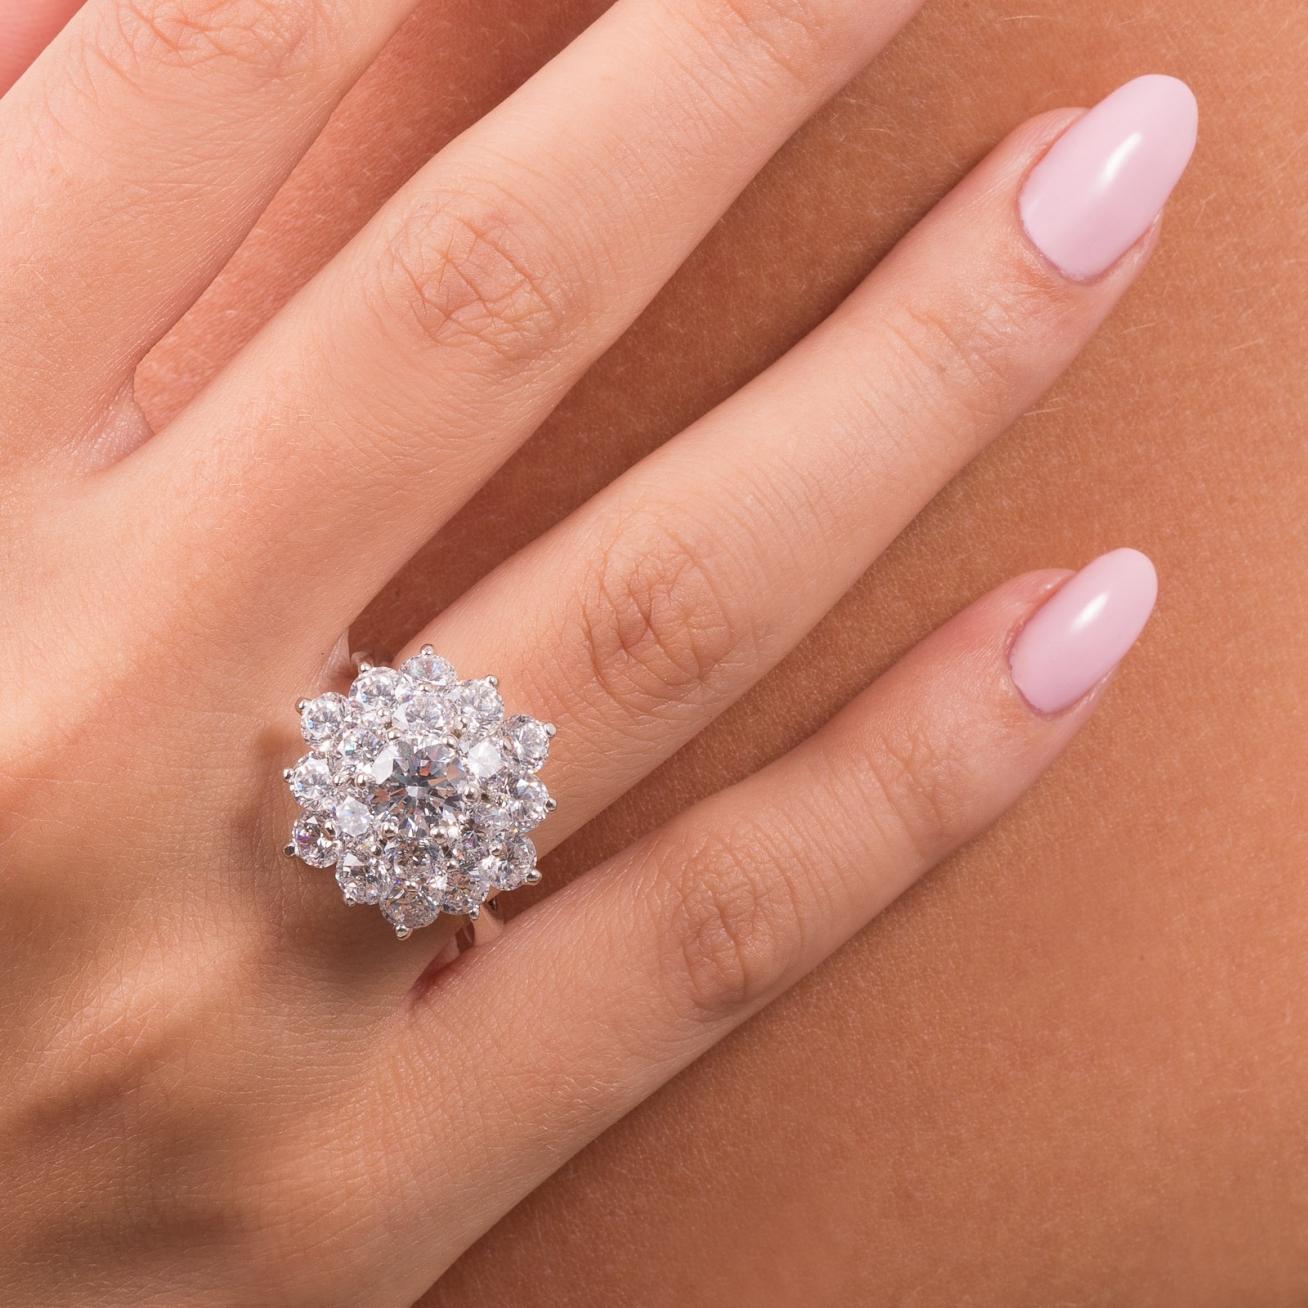 White flower silver ring ultima edizione white flower silver ring mightylinksfo